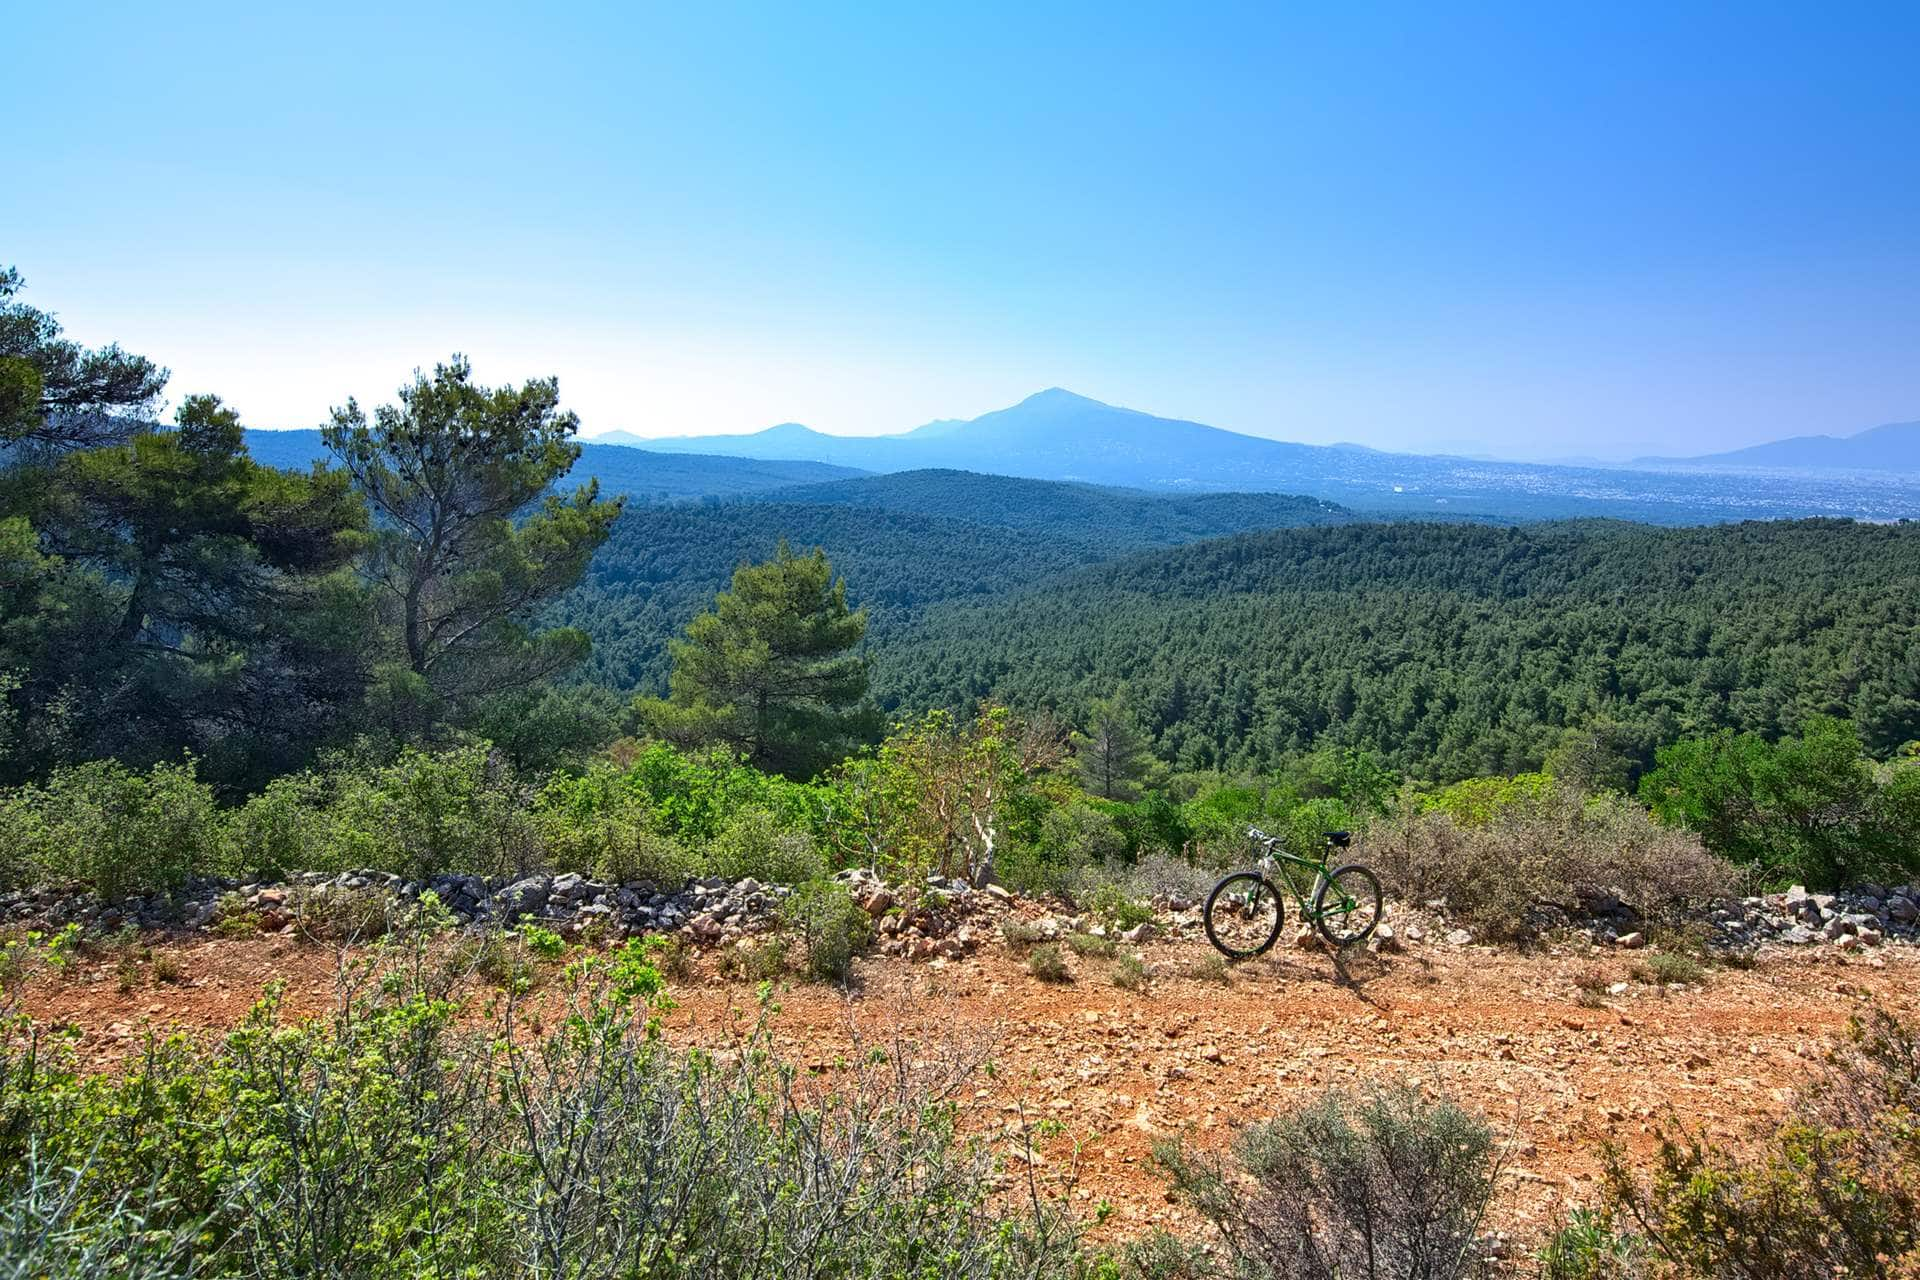 Mountain Biking (MTB) in Athens - Best MTB Trails Parnitha Mountain - Gr Cycling